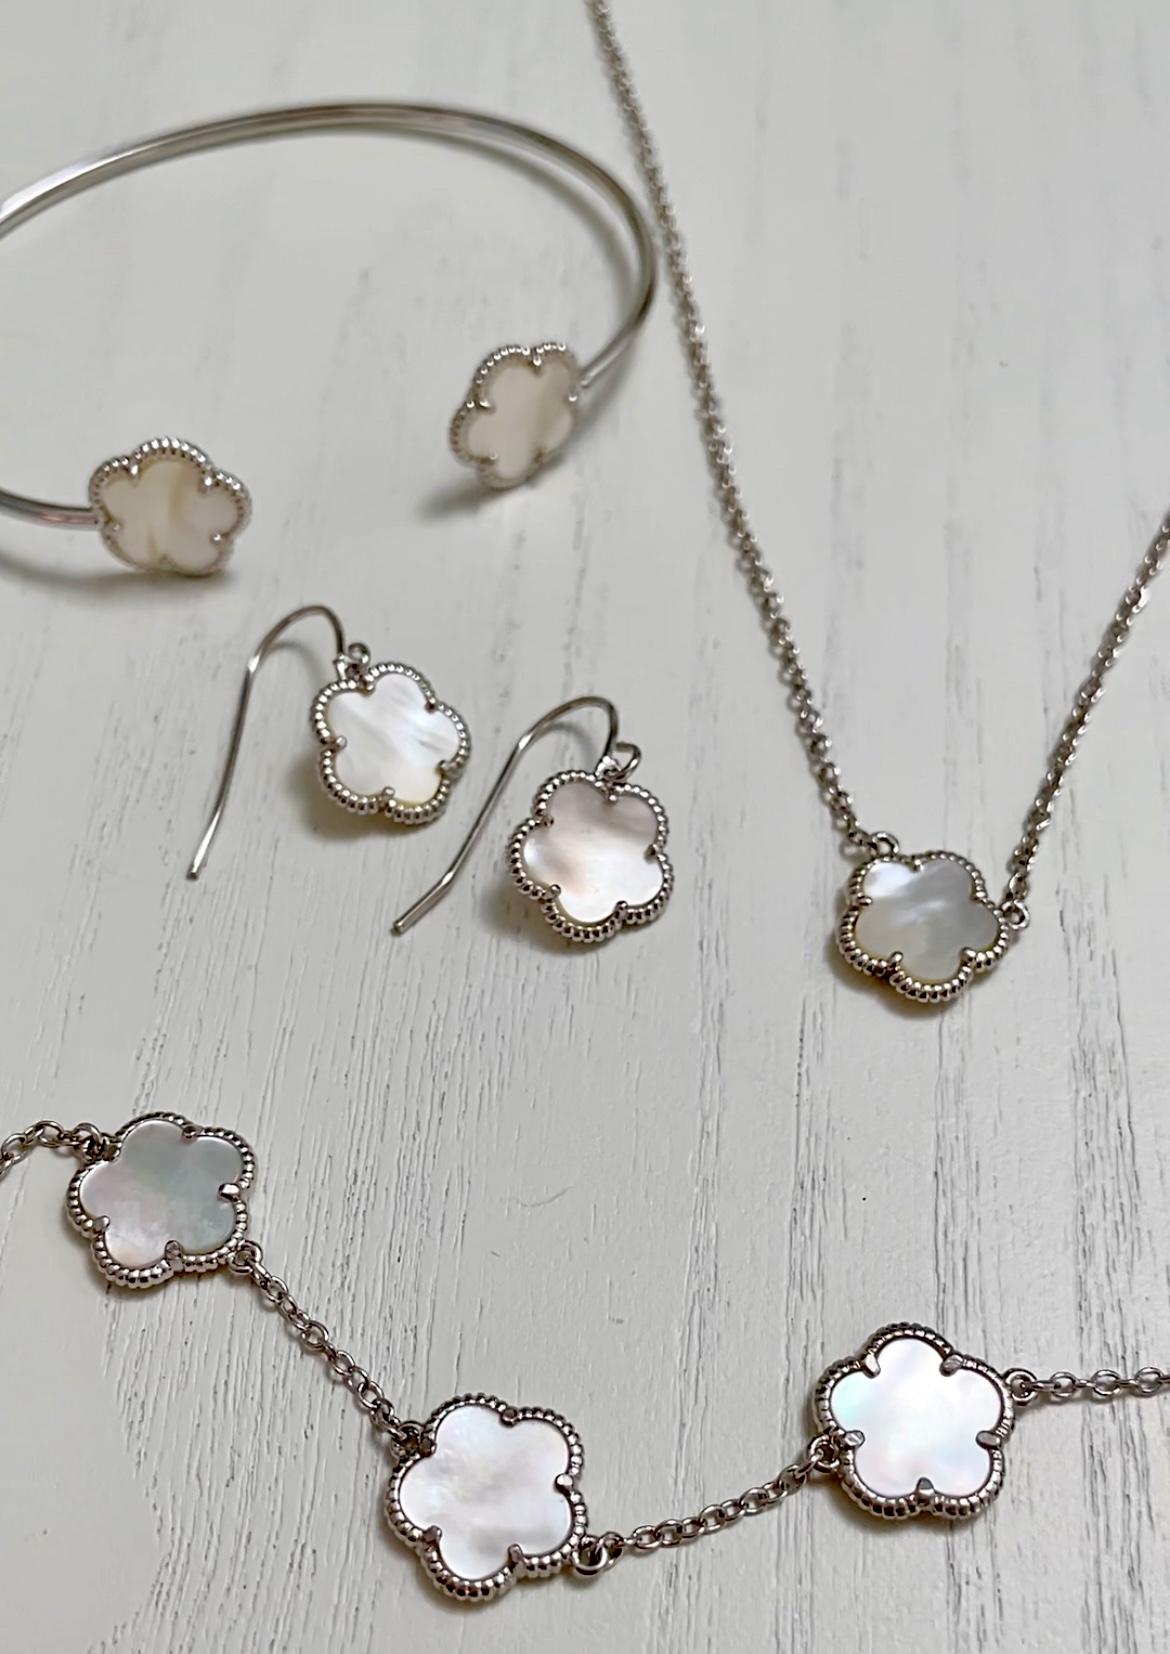 Jan Kou Clover Mother-Of-Pearl Jewelry